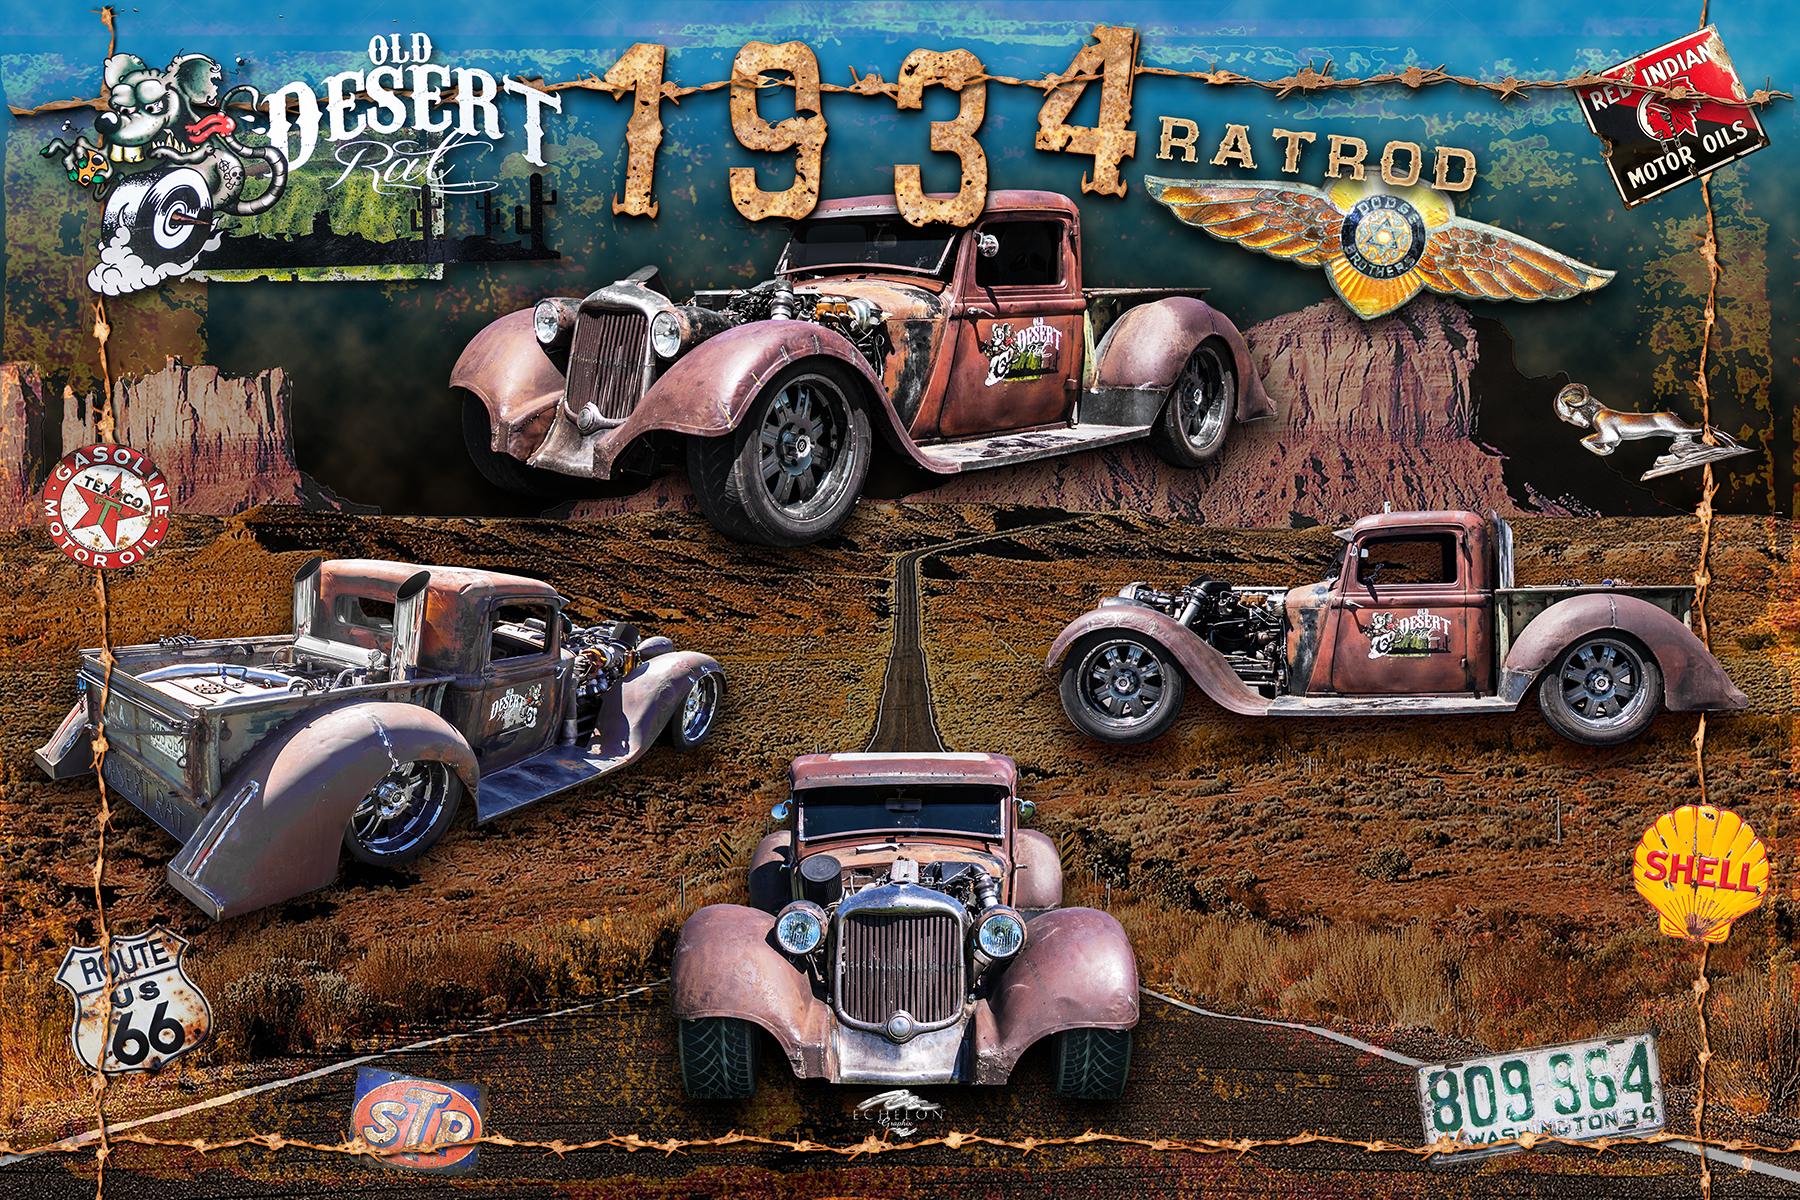 1934 Desert Ratrod